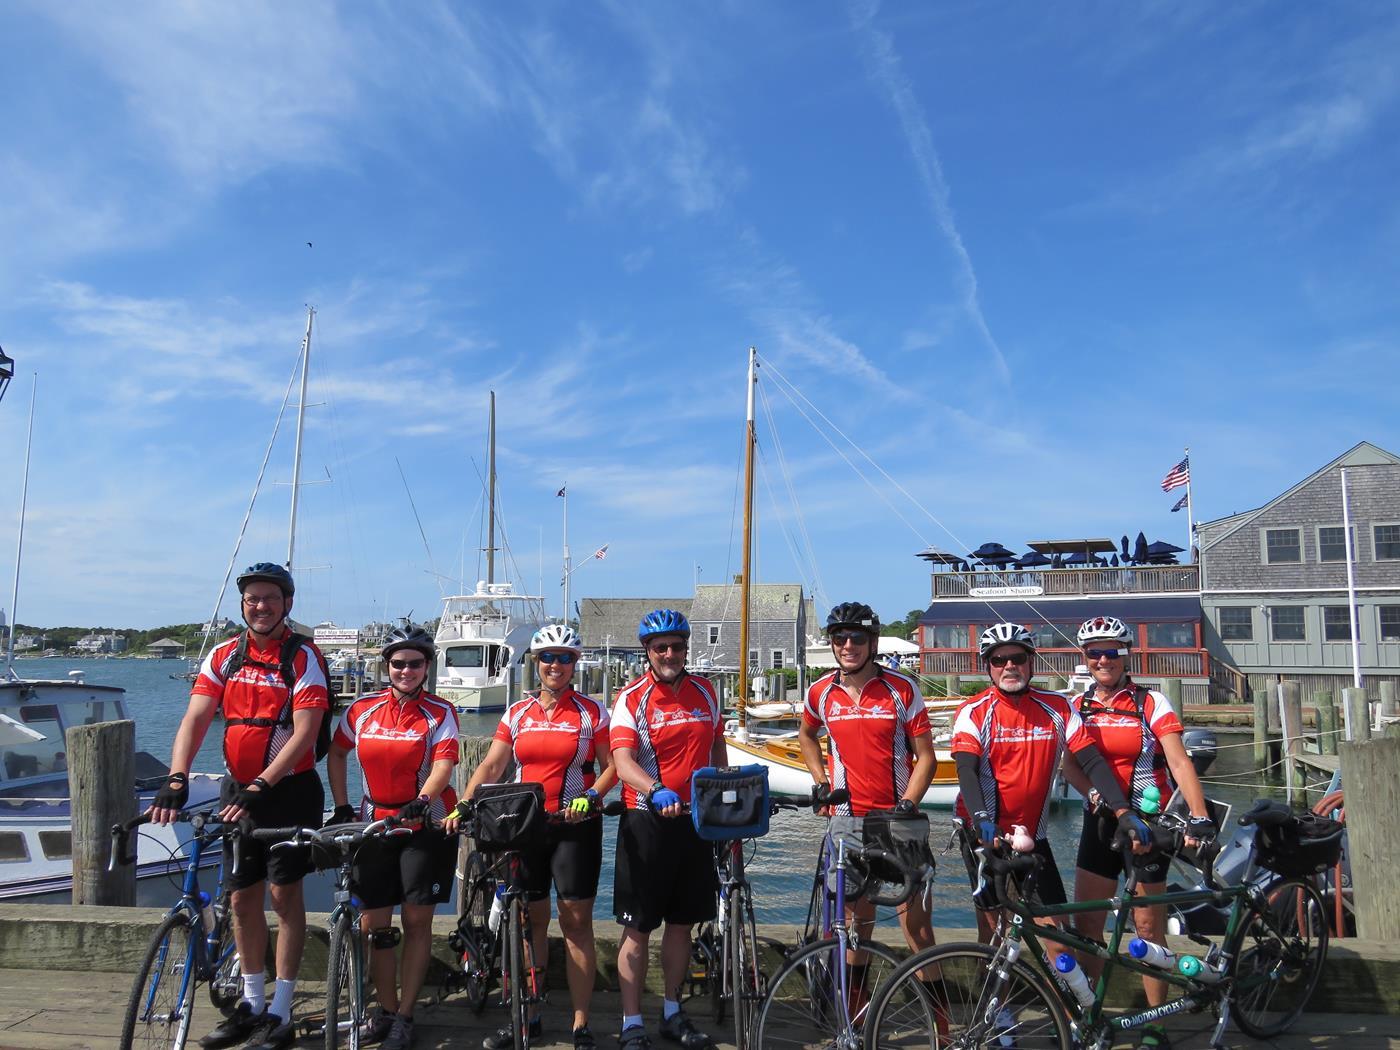 Cape Cod Bike Tour 1 Great Freedom Adventures